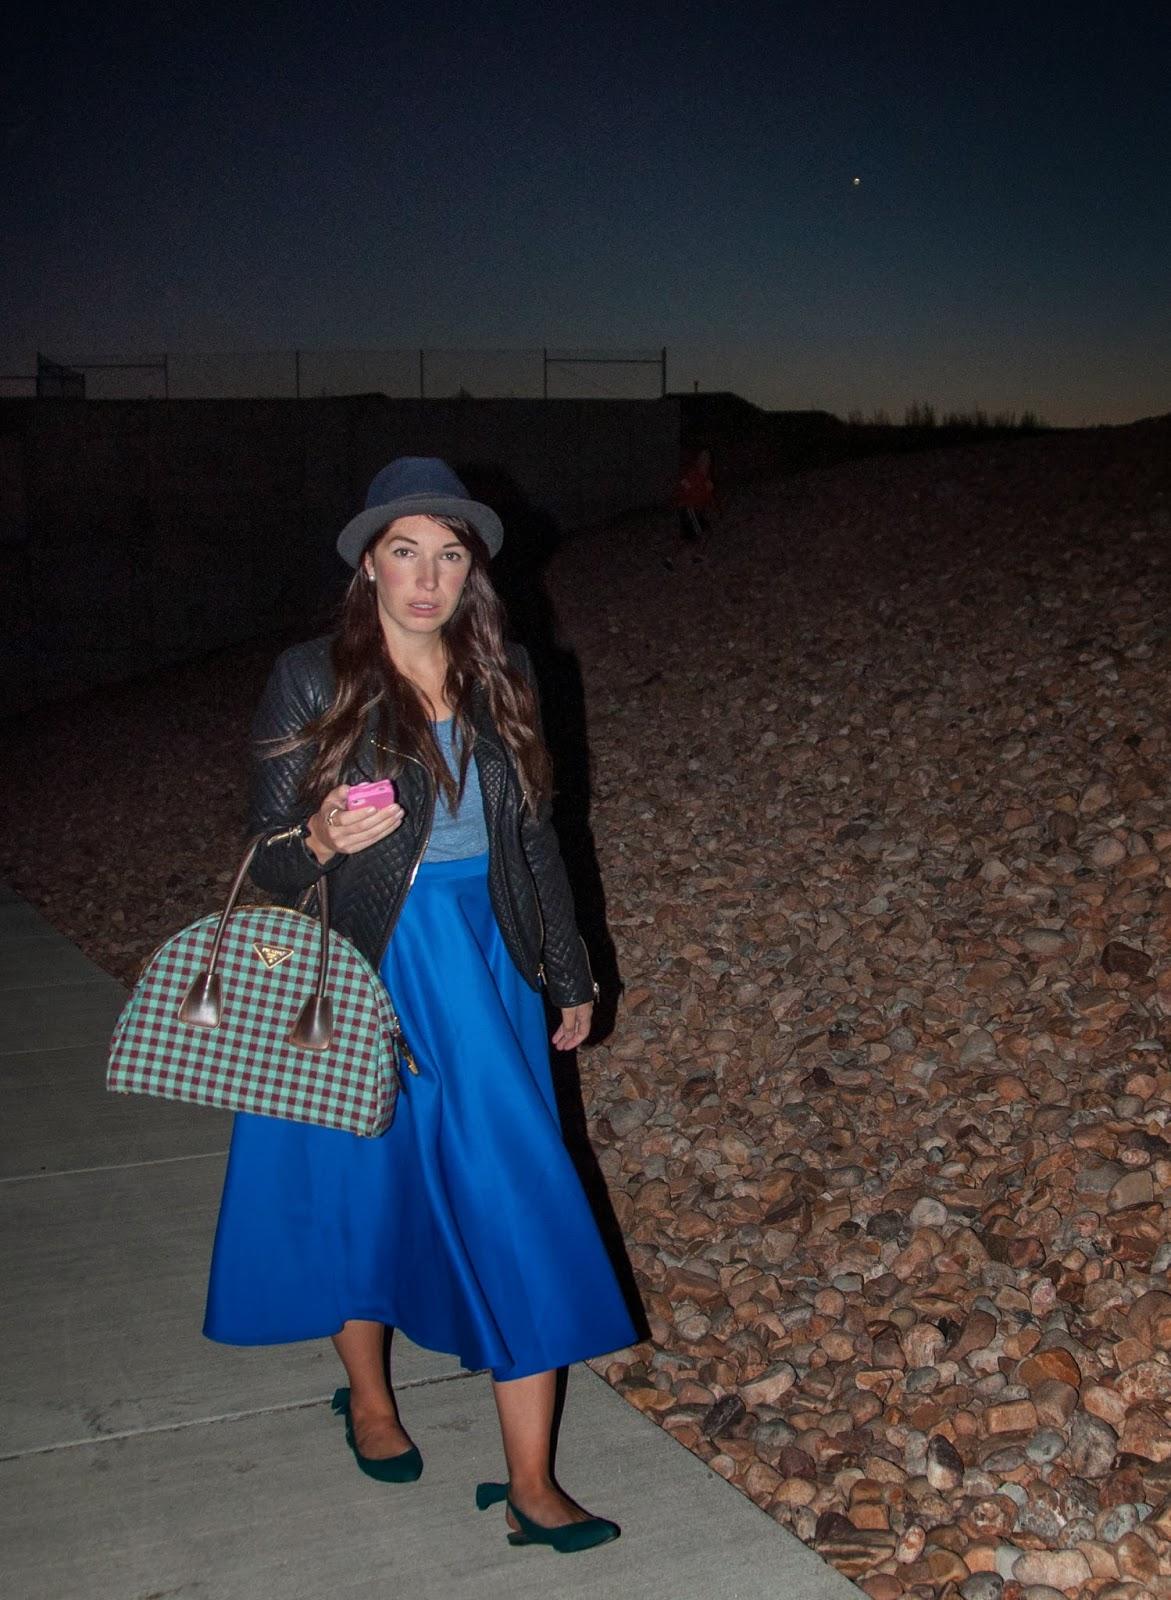 fashion blog, style blog, ootd, anthropologie ootd, fashion blogger,